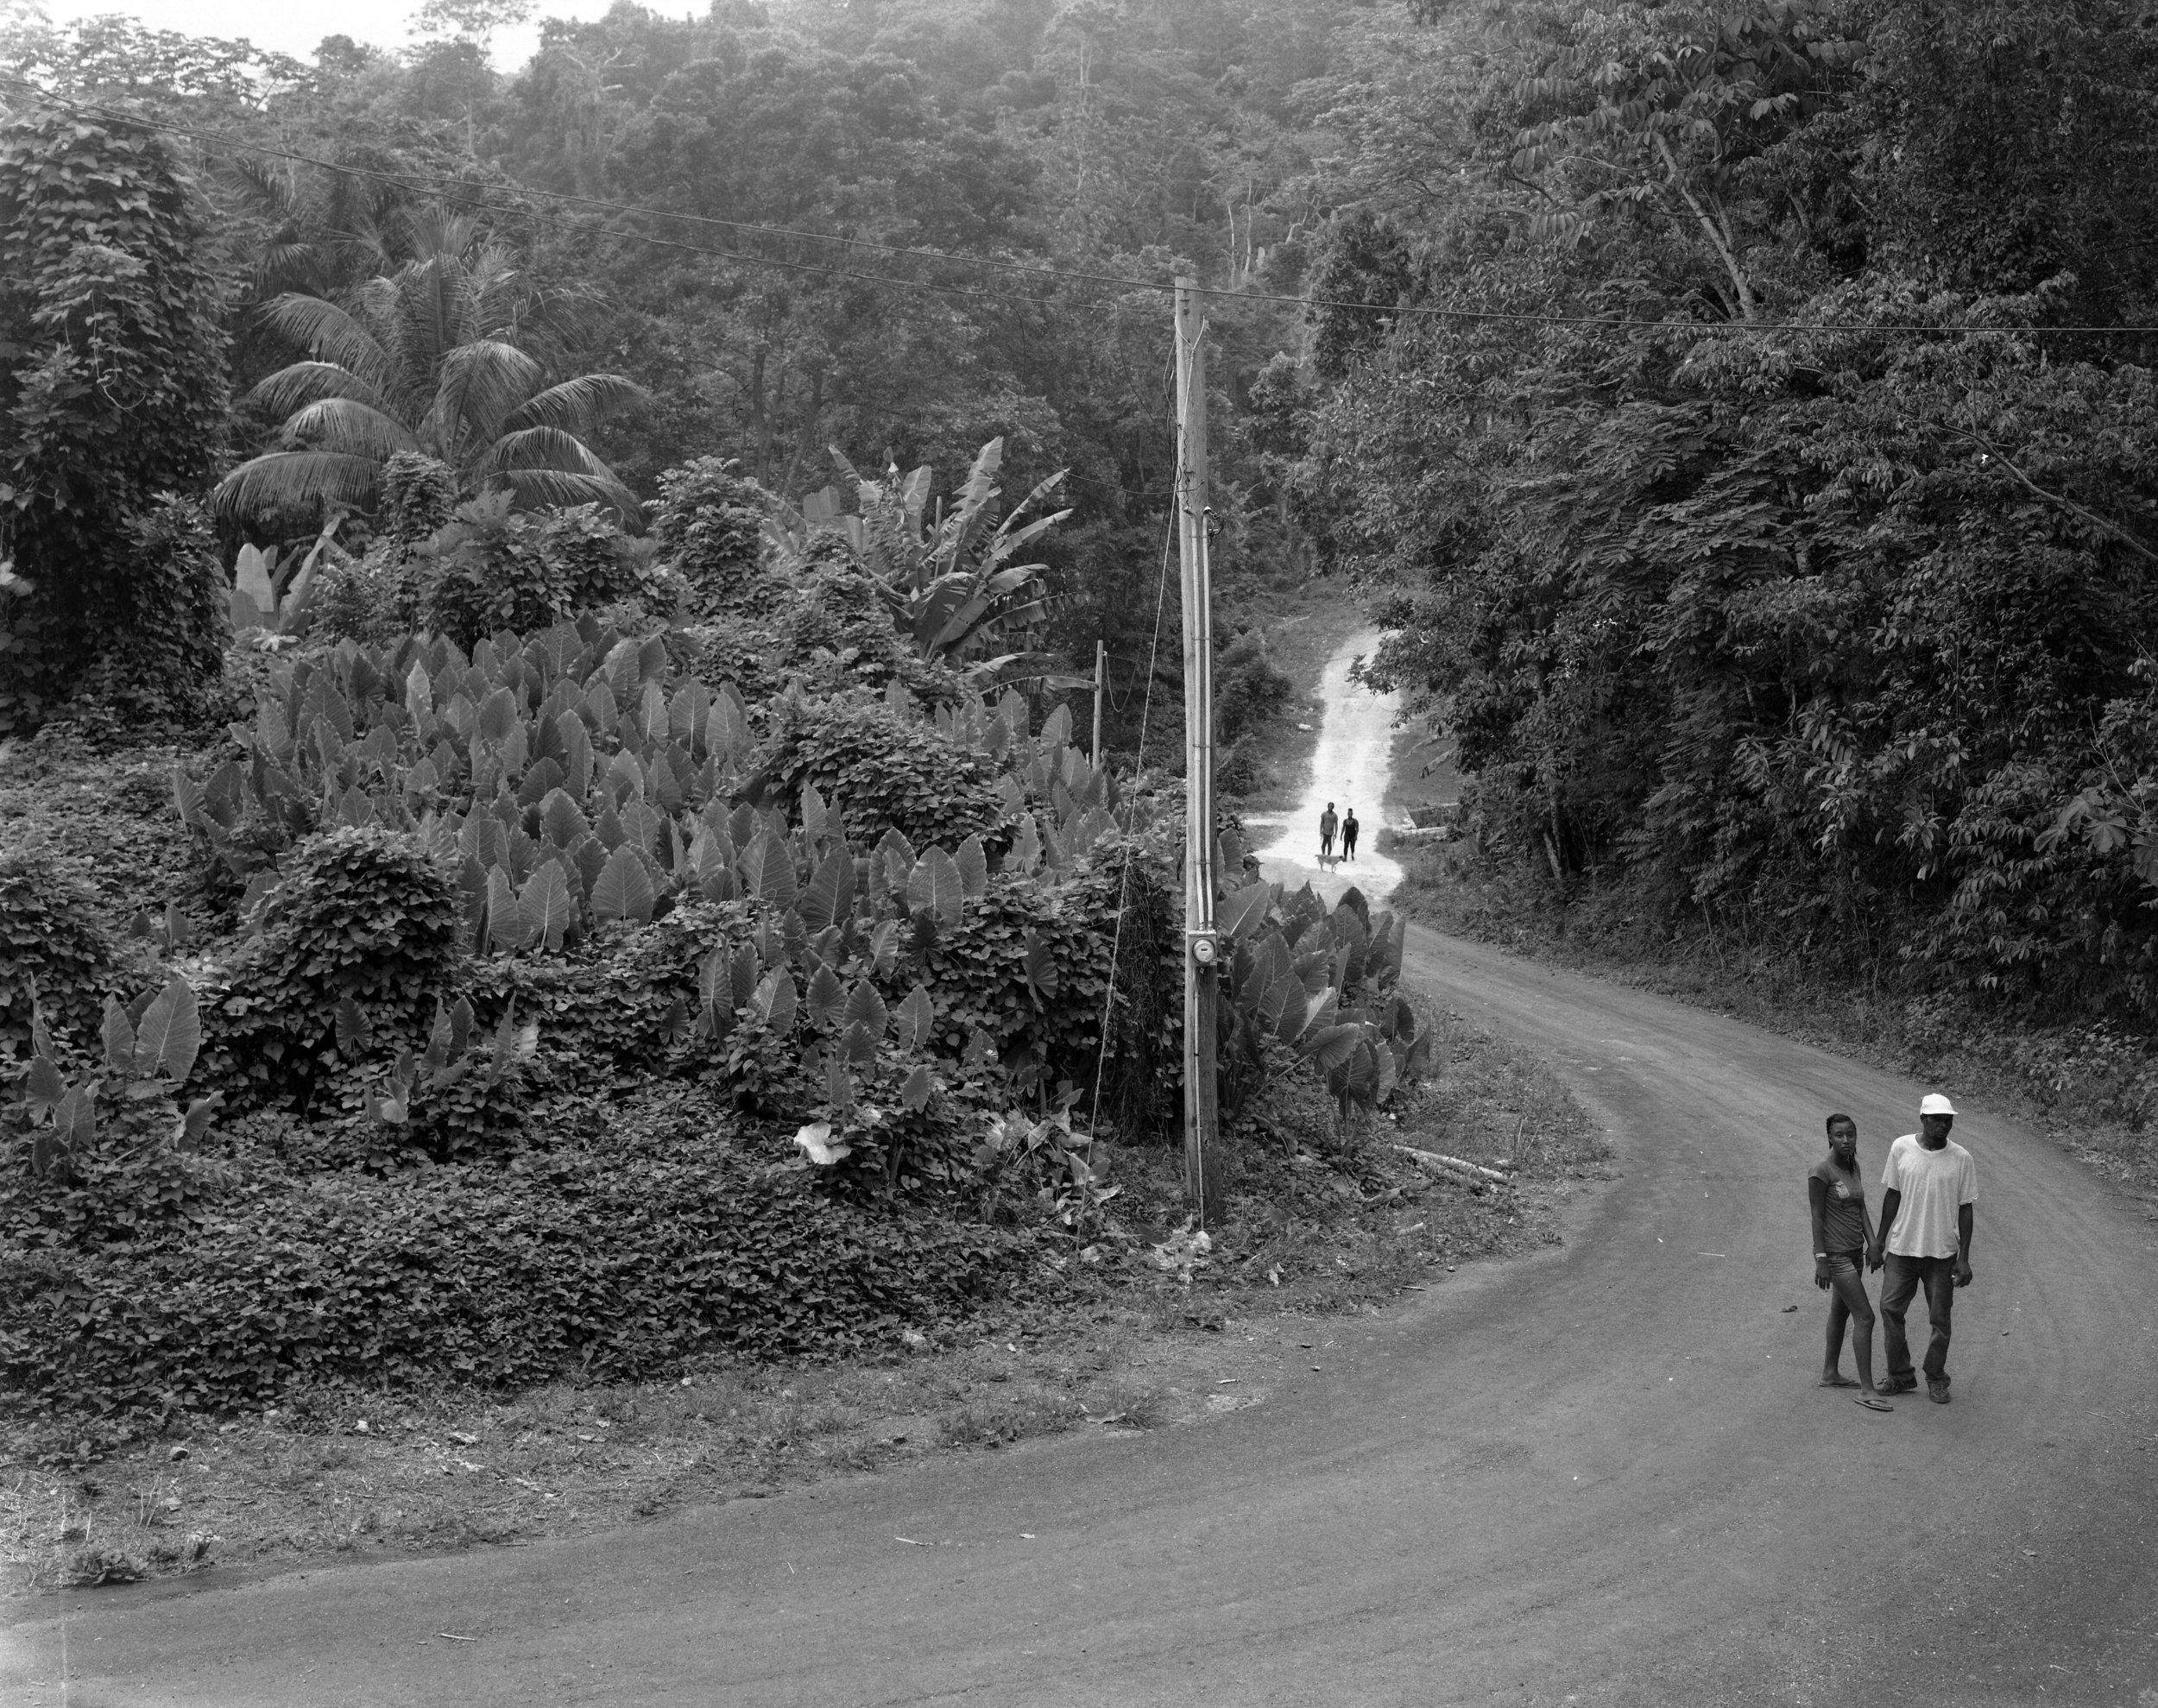 jamaica5.jpg